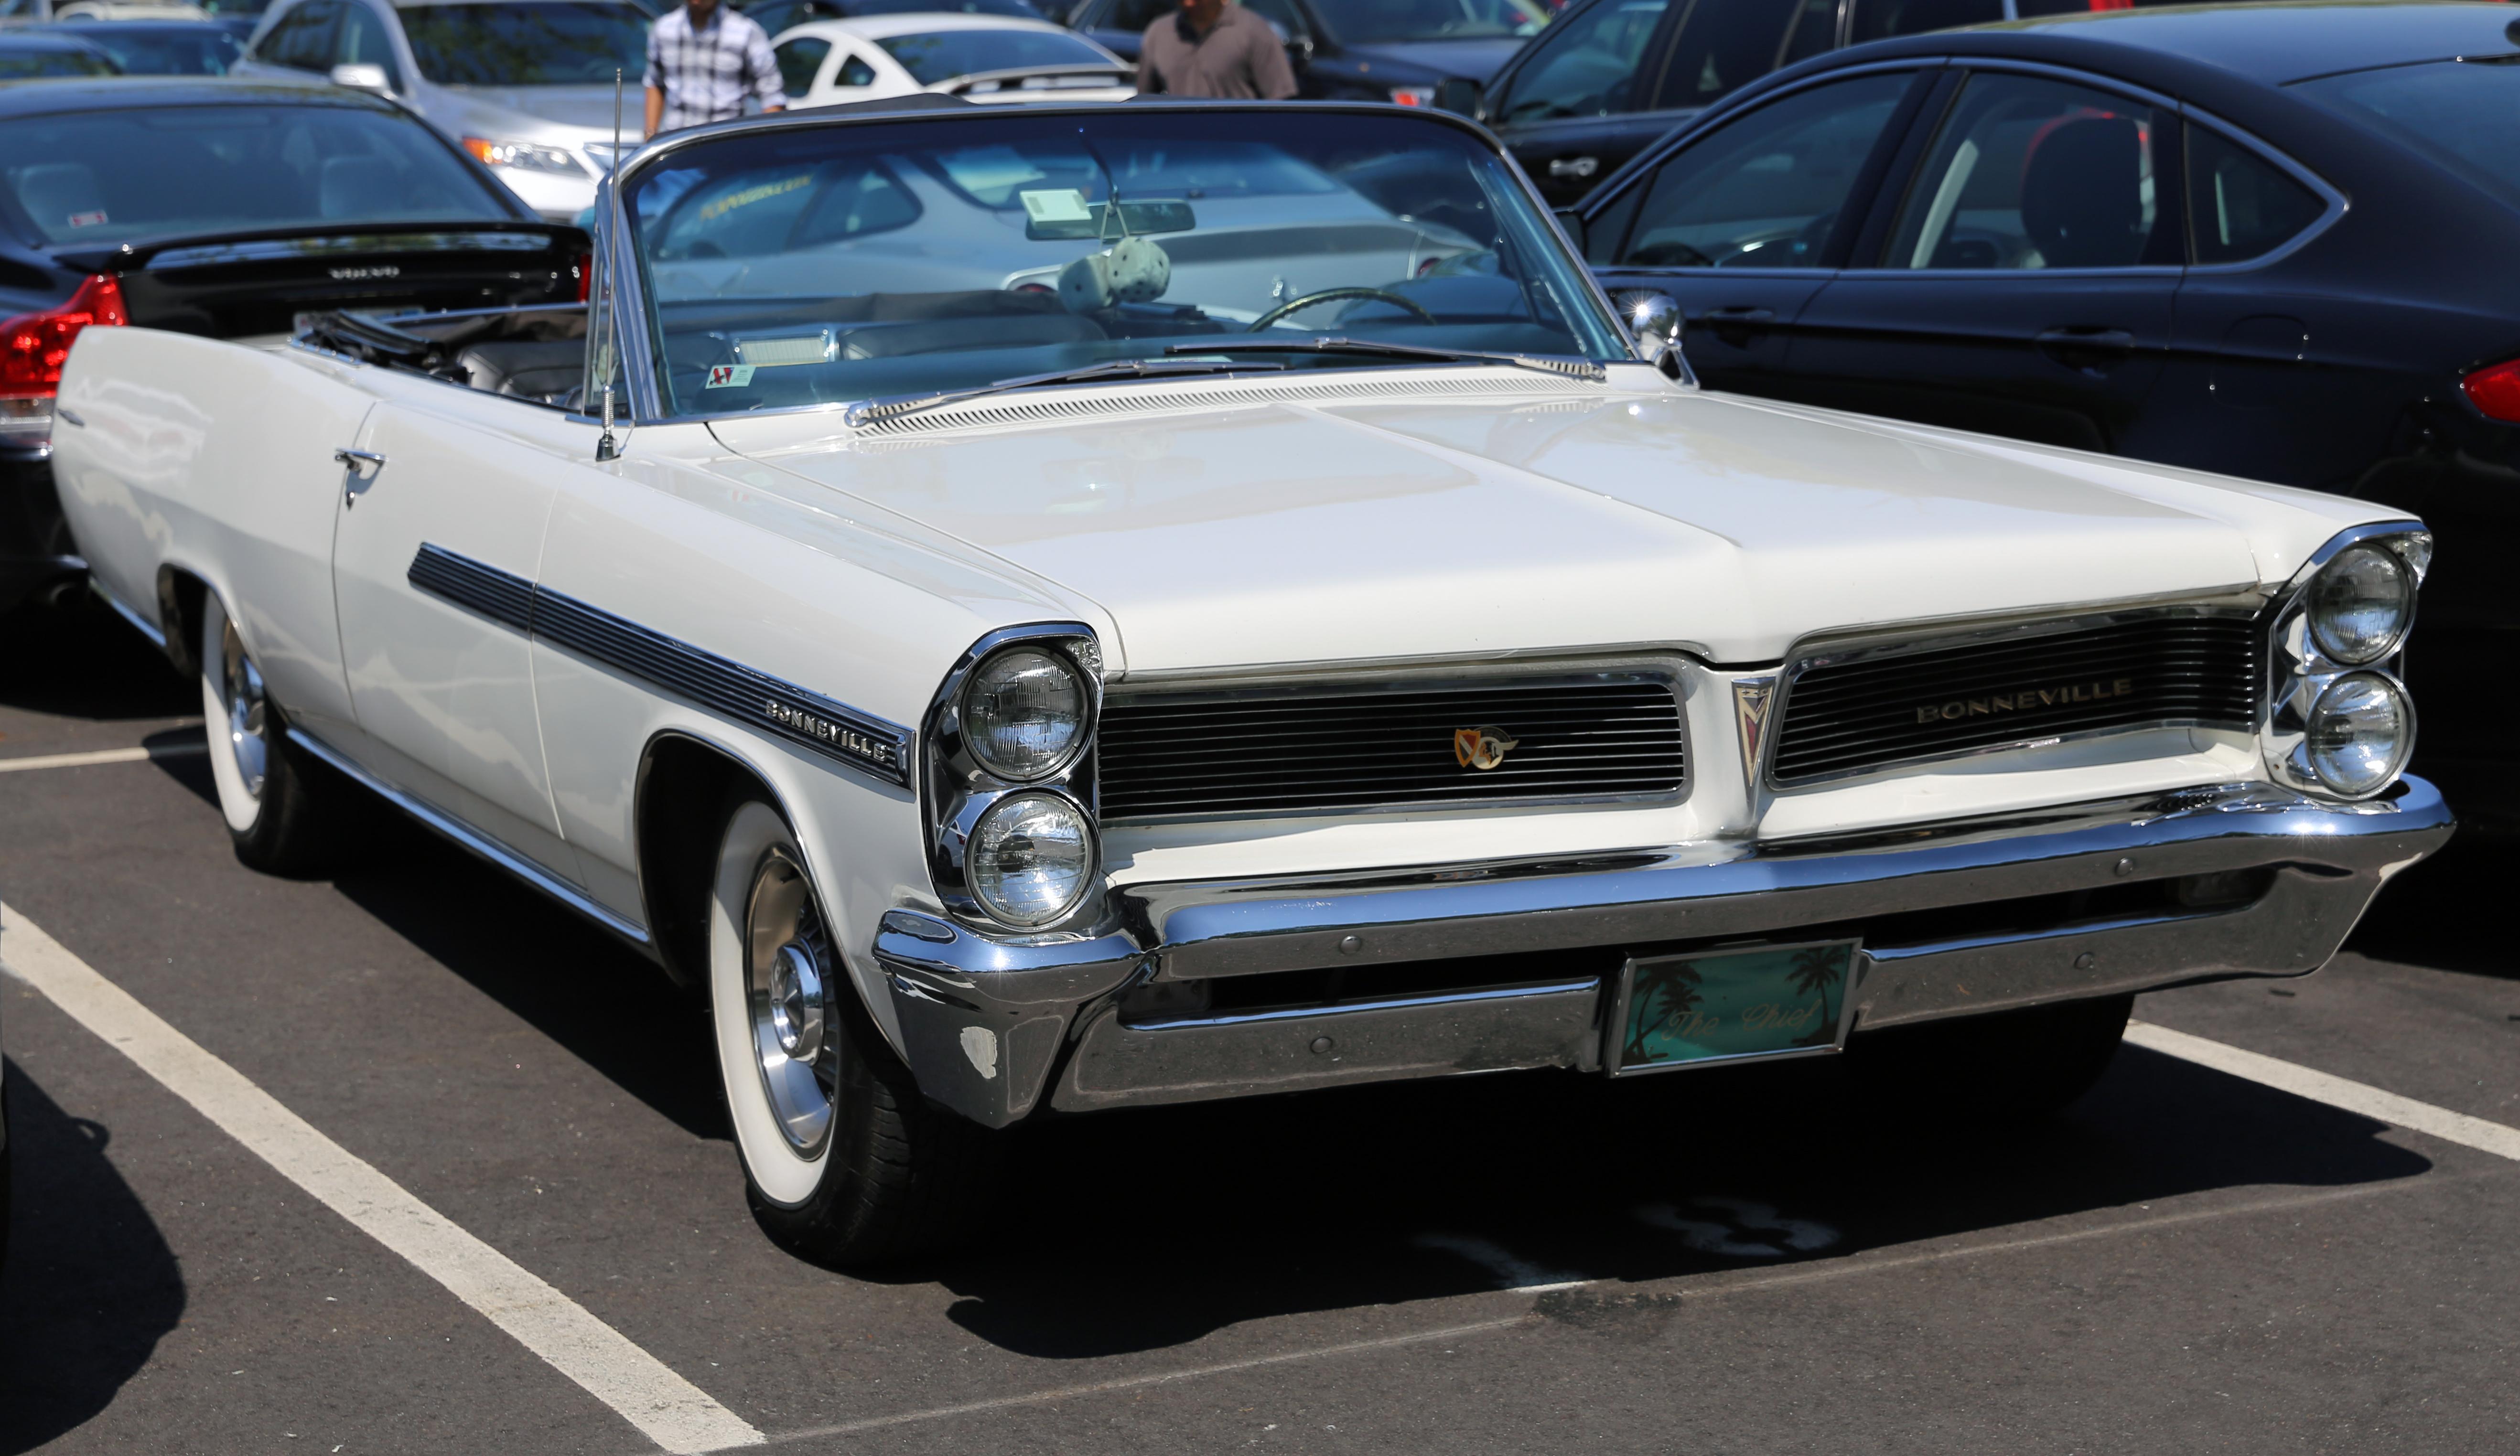 Pontiac LeMans IV 1973